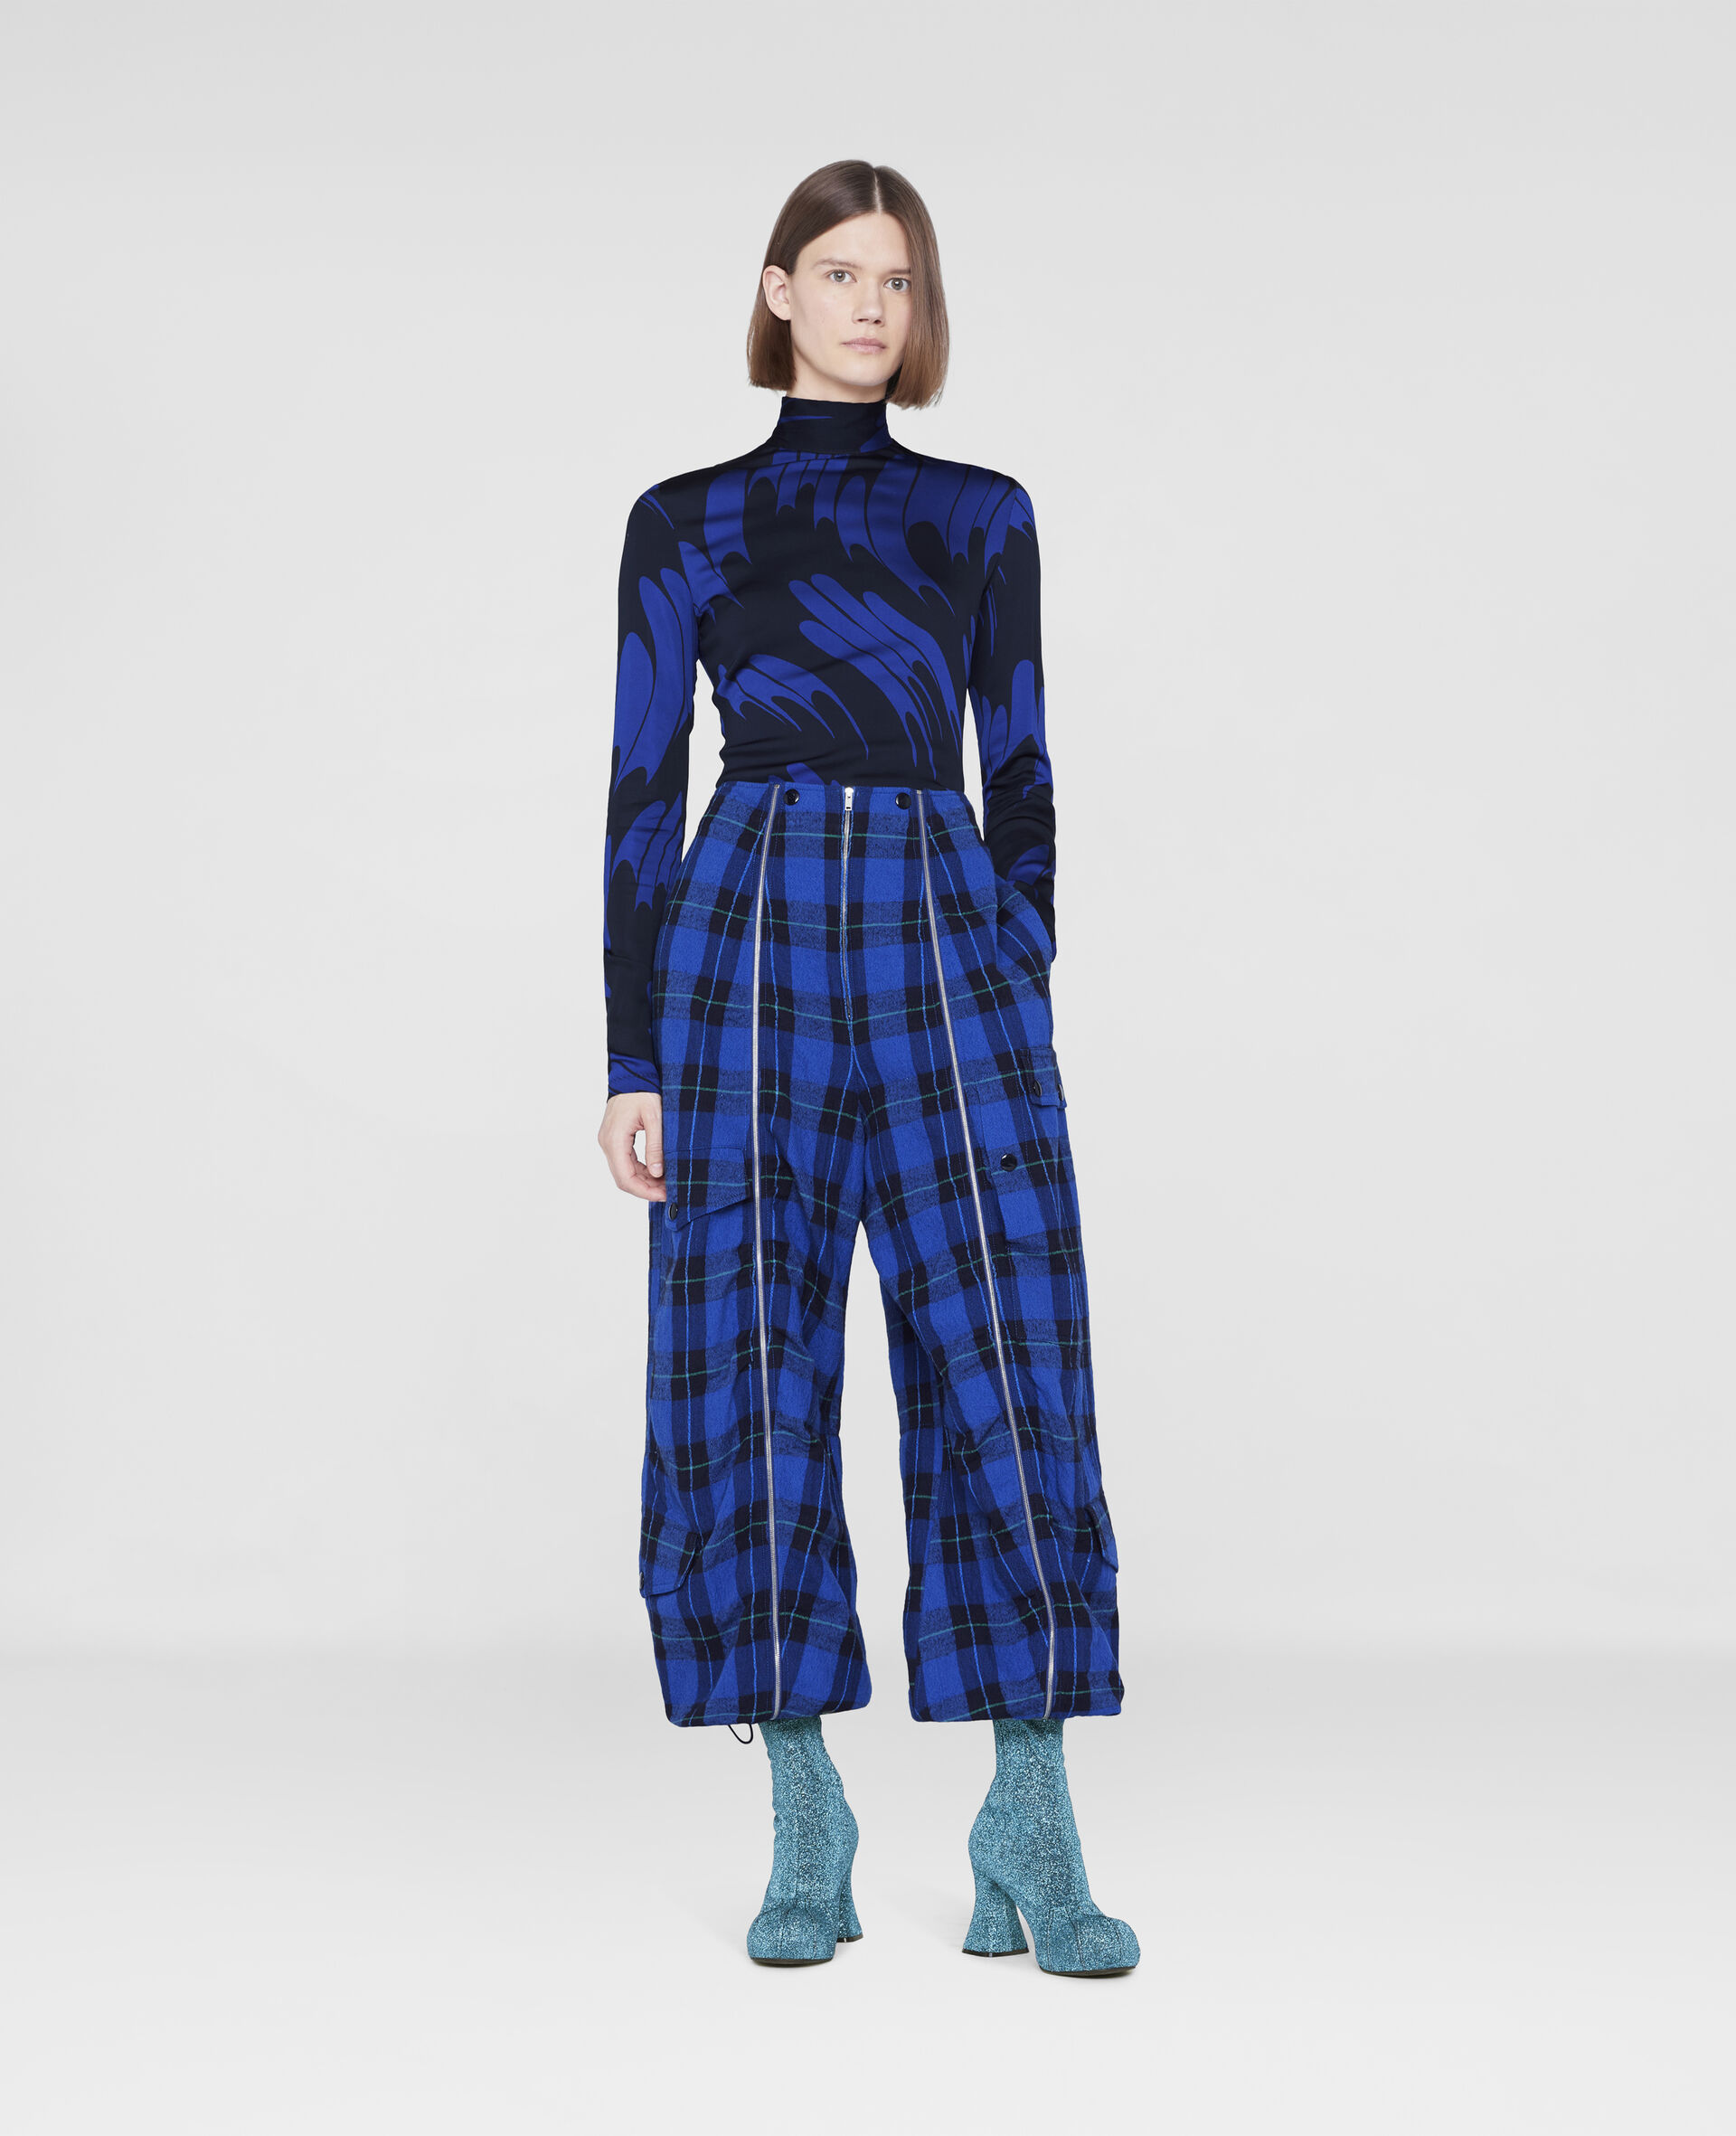 Pantalon Nella-Fantaisie-large image number 1